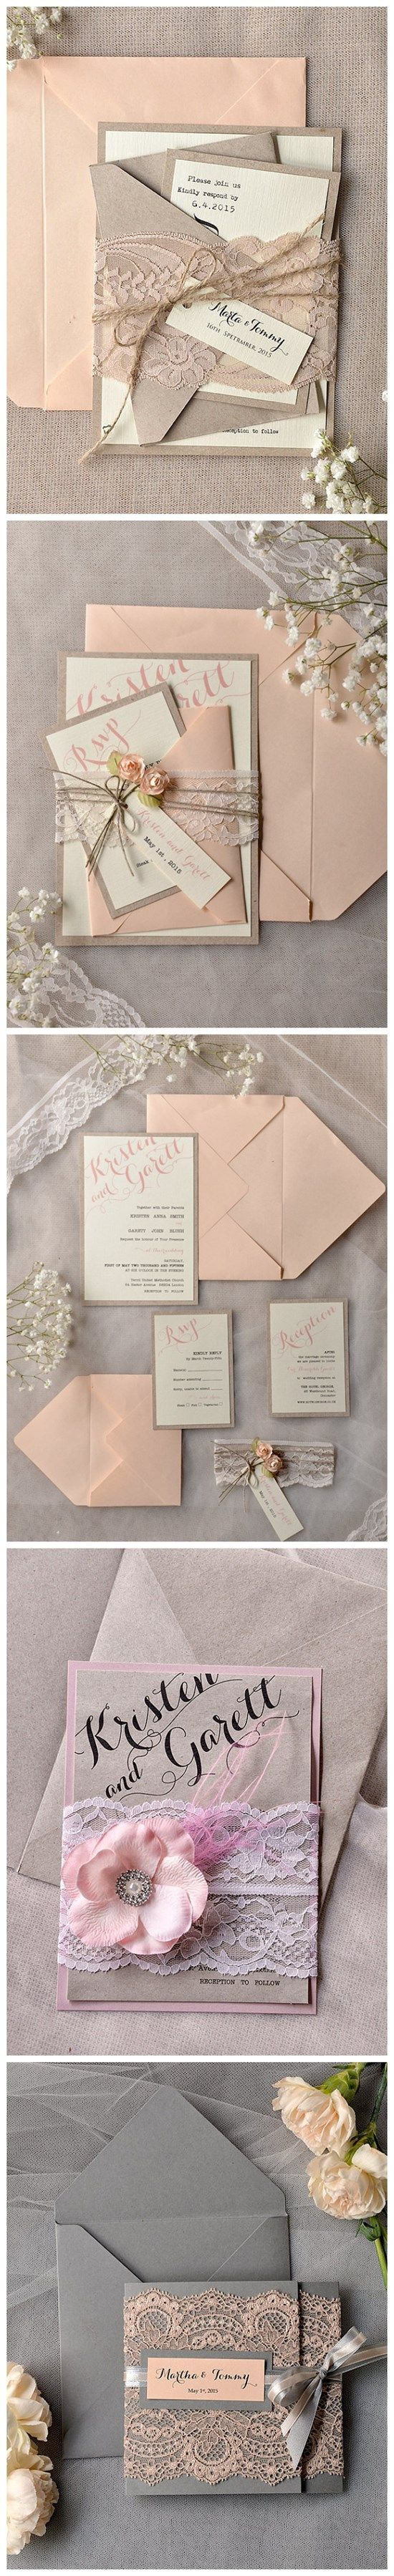 TOP 30 Chic Rustic Wedding Invitations from 4lovepolkadots | Blush pink